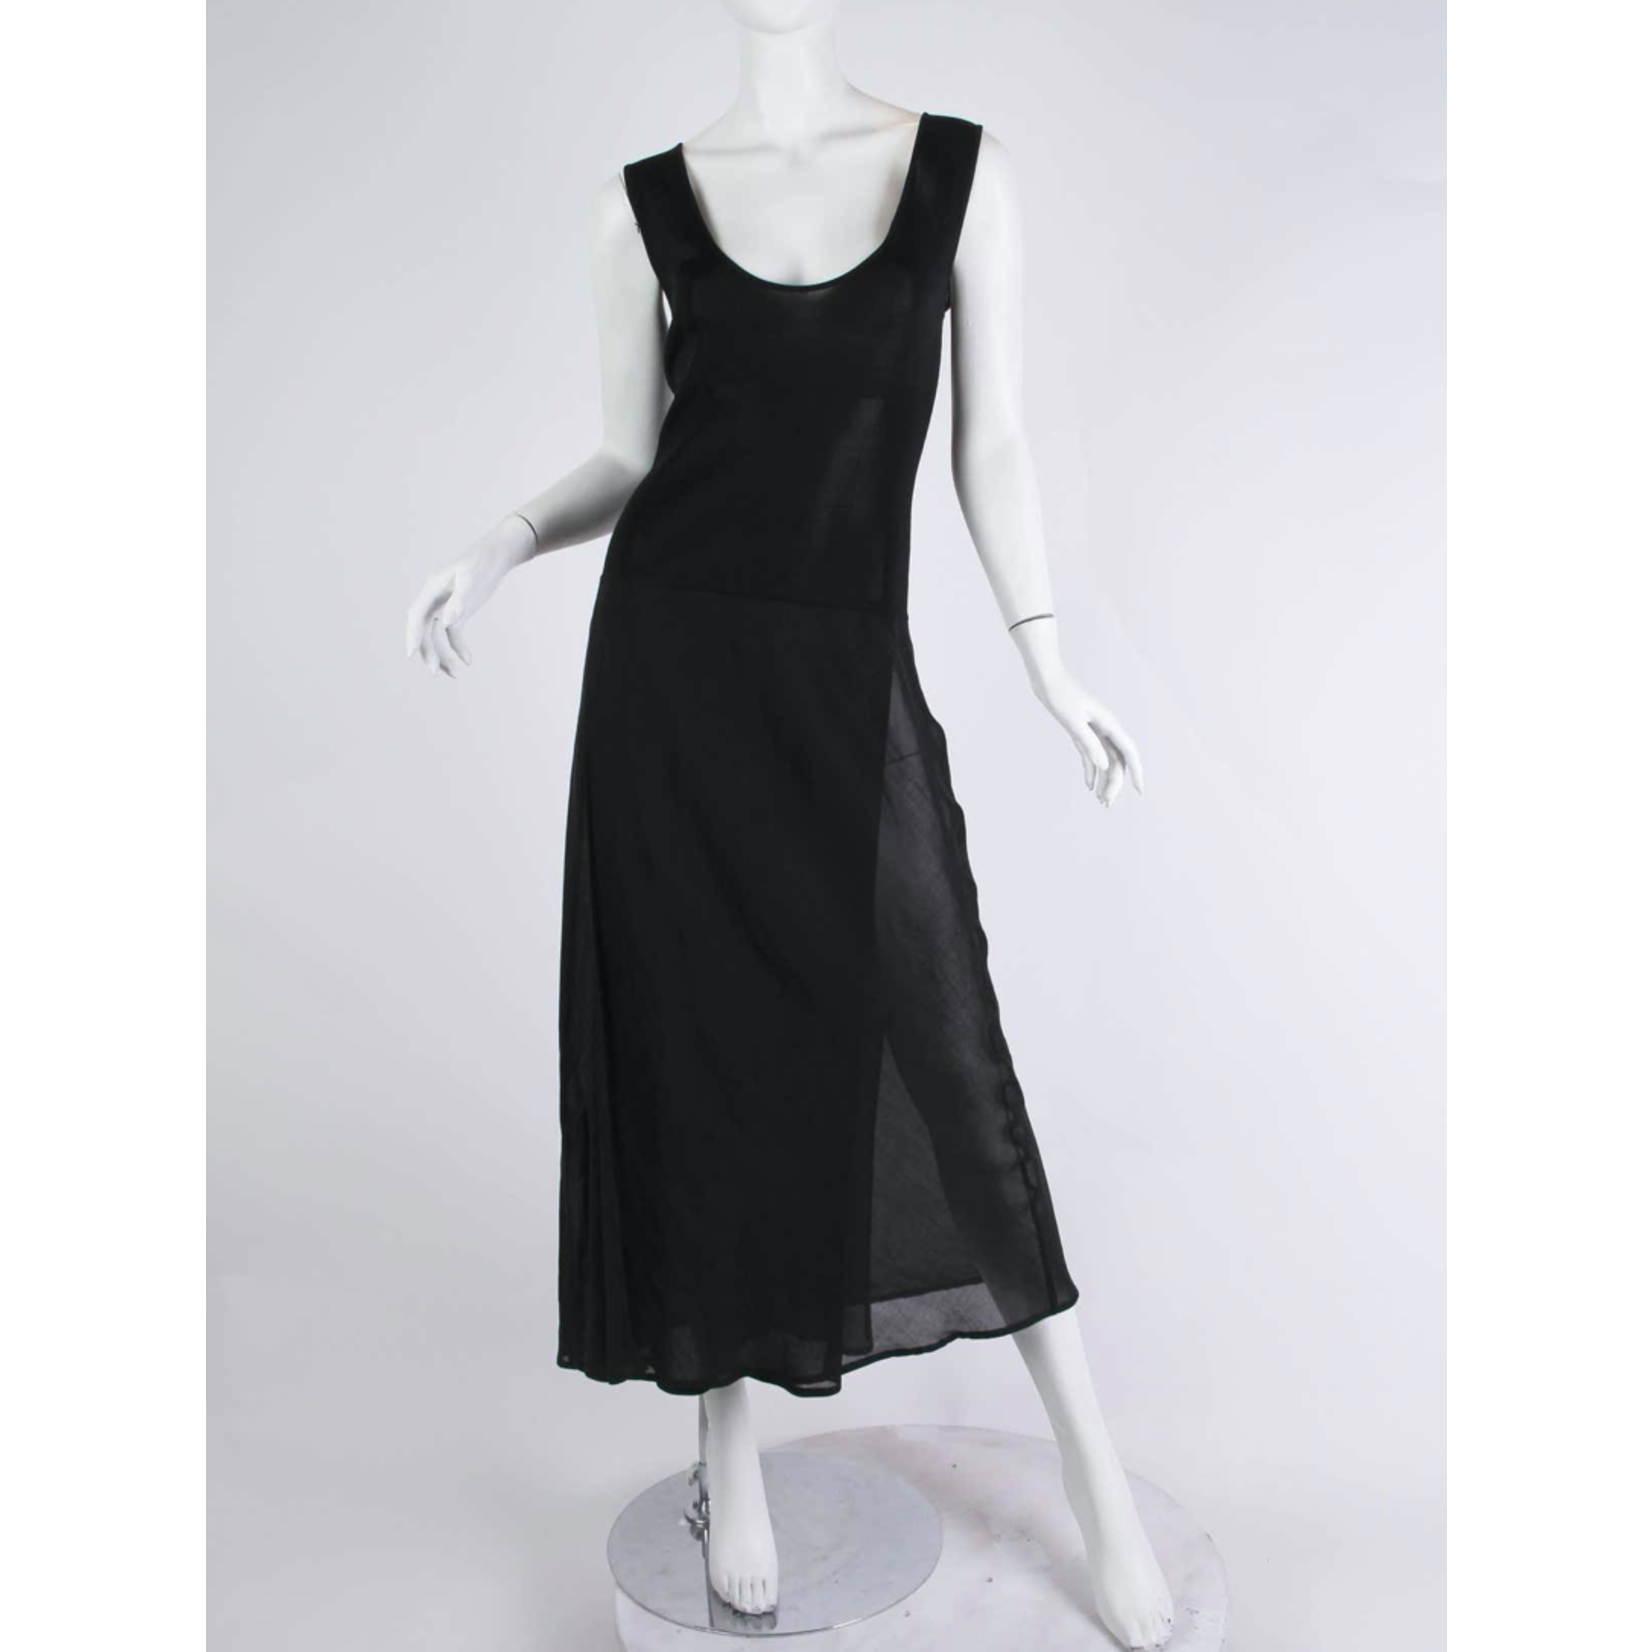 1990s Black Viscose Knit & Bias Chiffon Minimalist Dress DSDD3ON83